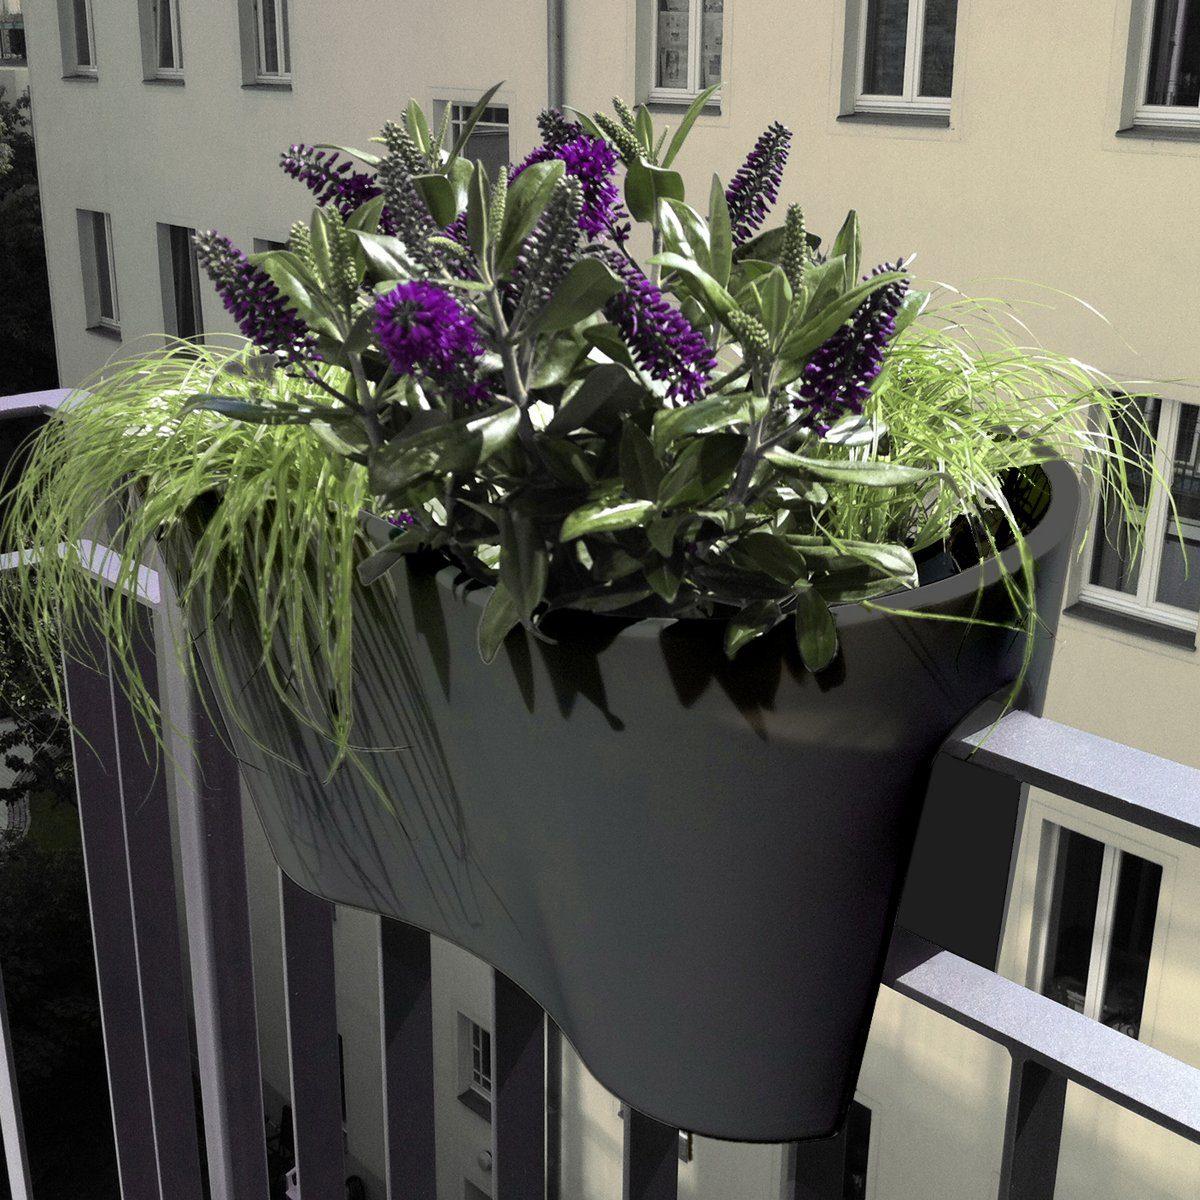 REPHORM rephorm Blumenkasten STECKLING DUO anthrazit